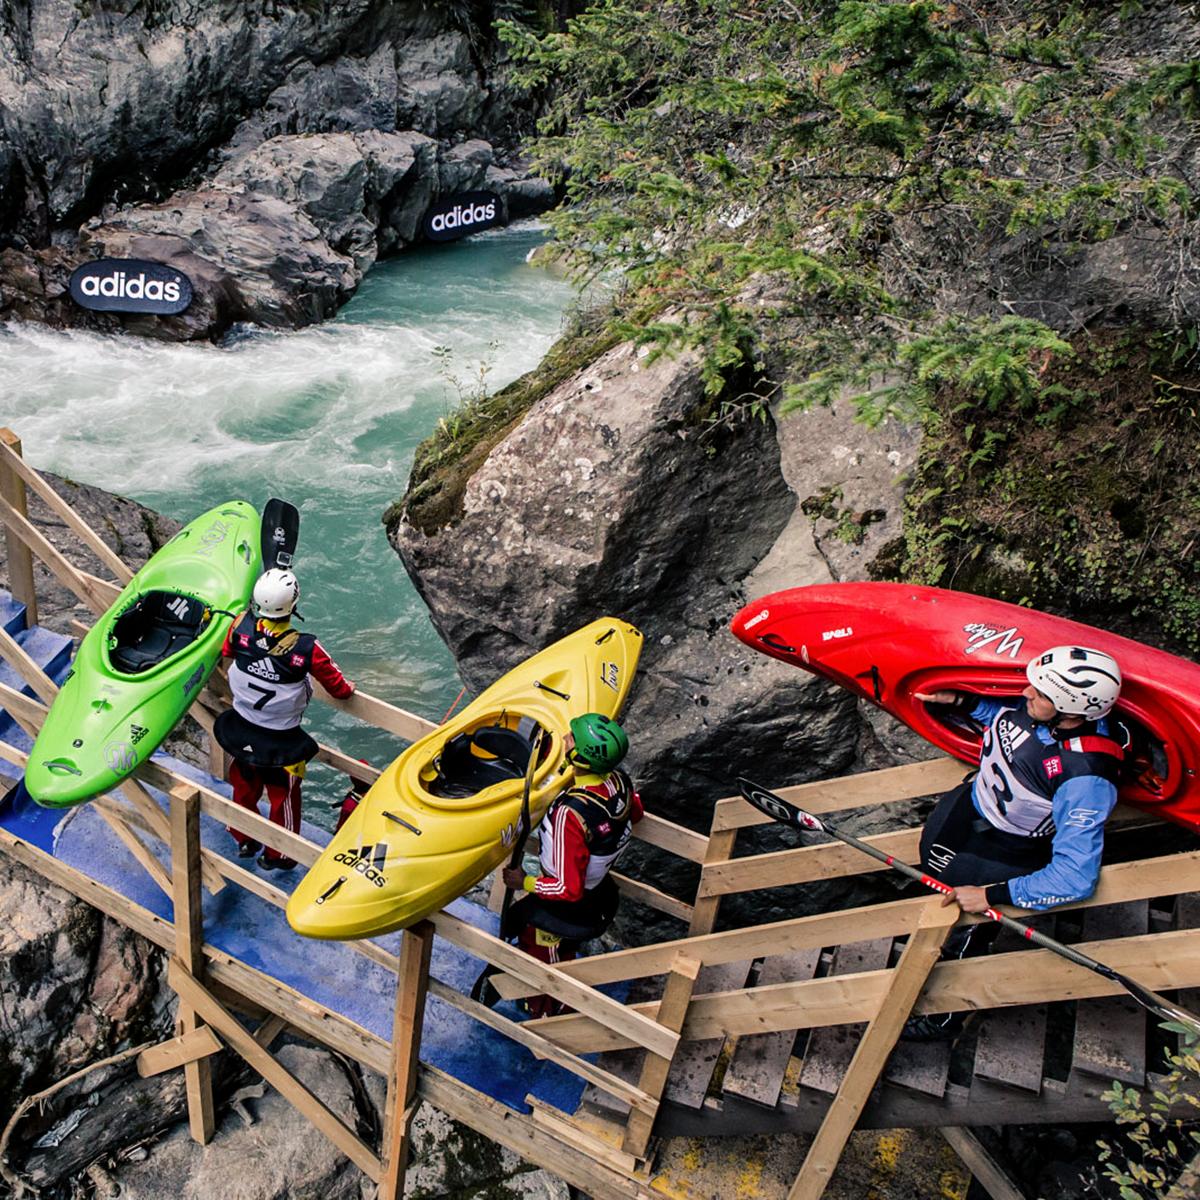 Incitar Restricción Restaurar  So sick of waiting – On October 6th the adidas Sickline Extreme Kayak World  Championships are on! The best wild … | Whitewater kayaking, White water  kayak, Kayaking